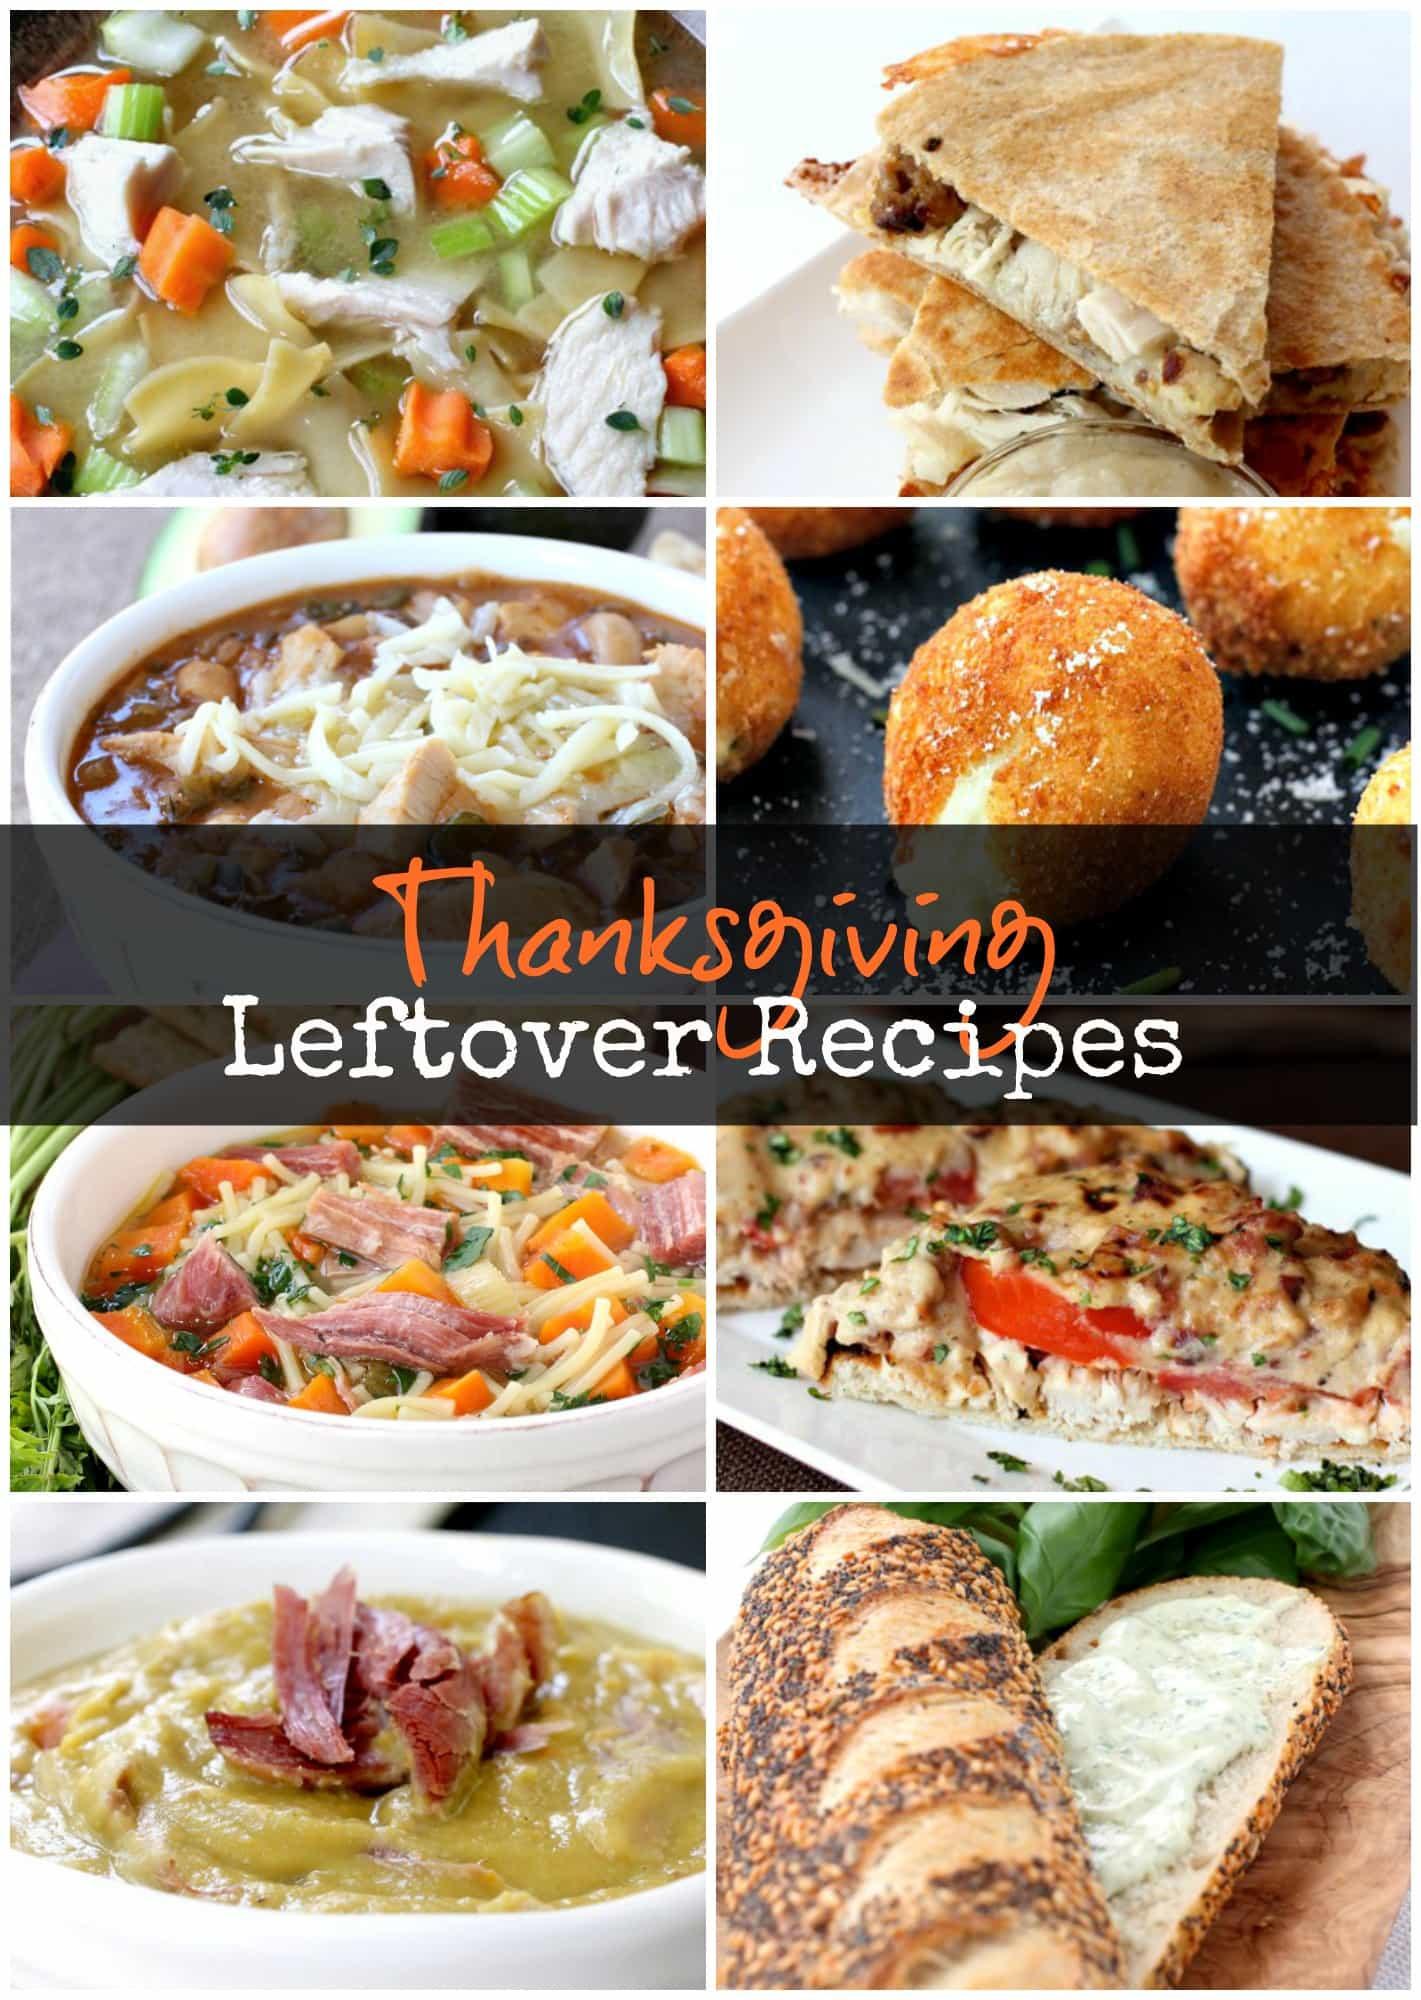 Thanksgiving Leftovers Recipes  Thanksgiving Leftover Recipes Mantitlement